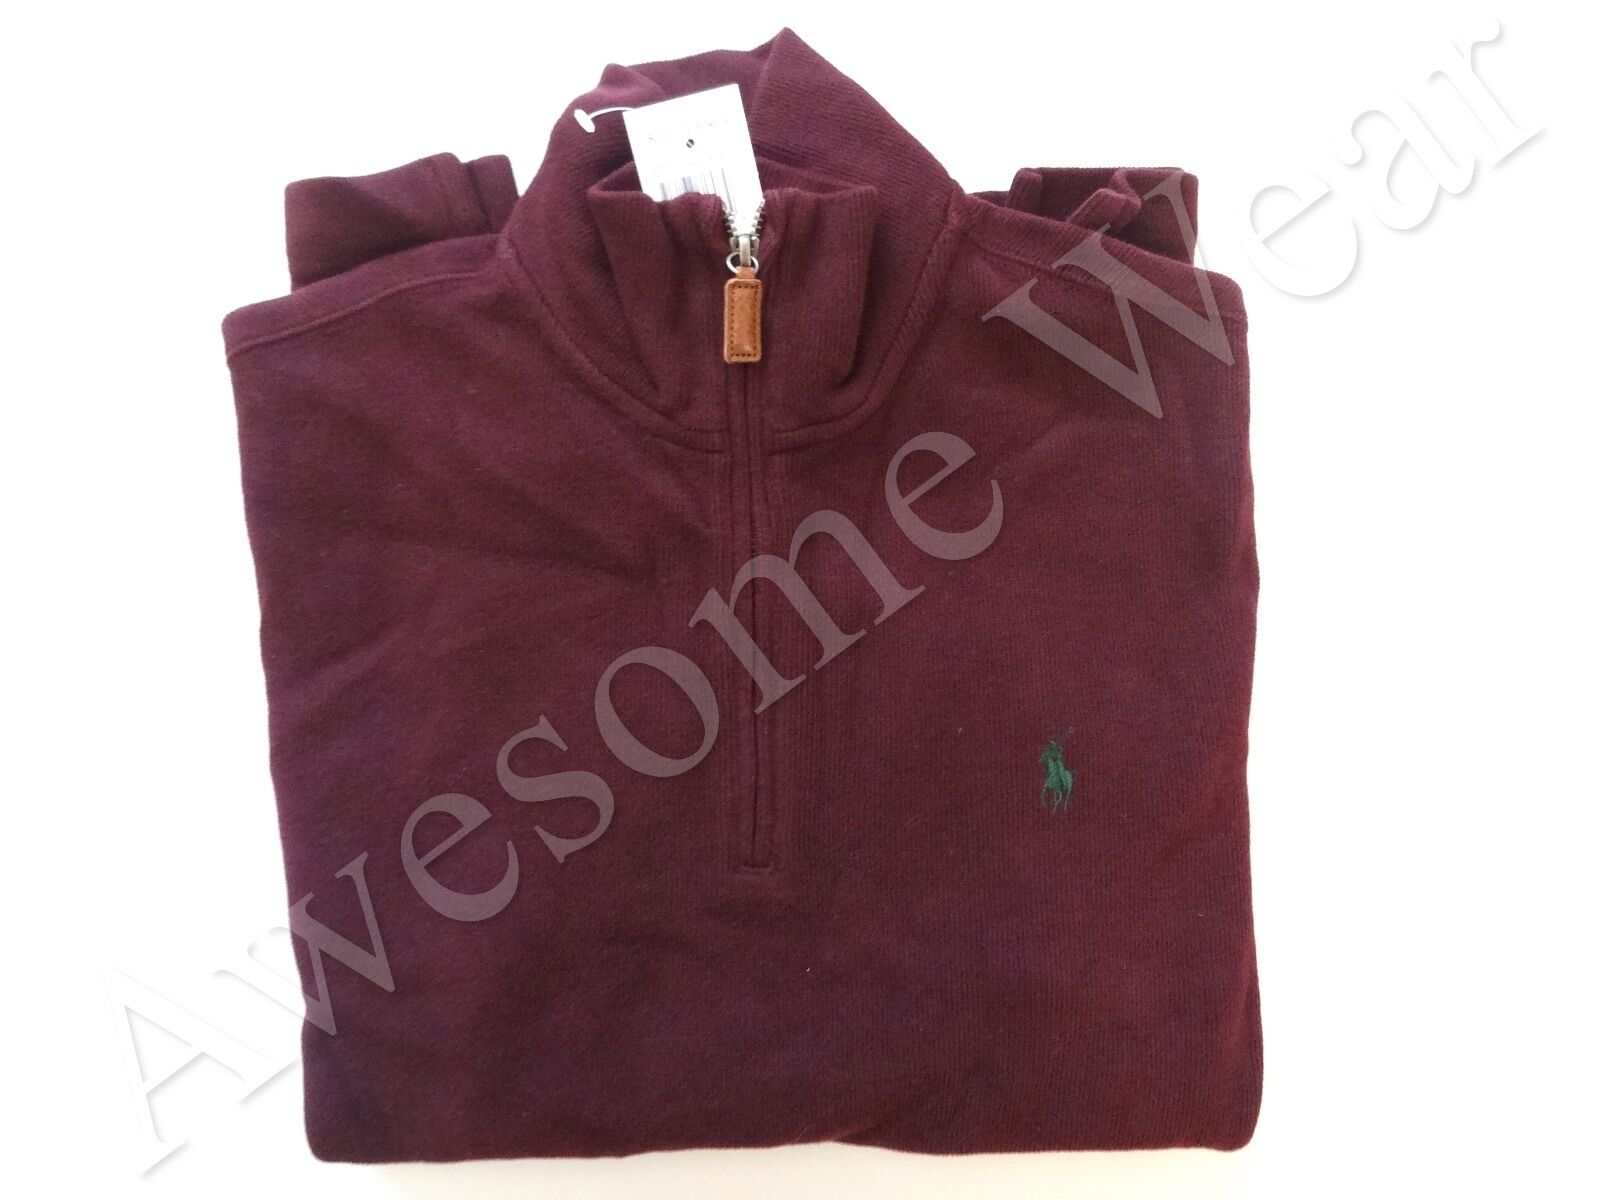 New Ralph Lauren Polo Burgundy ROT Half Zip Ribbed 100% Cotton Sweater Größe S